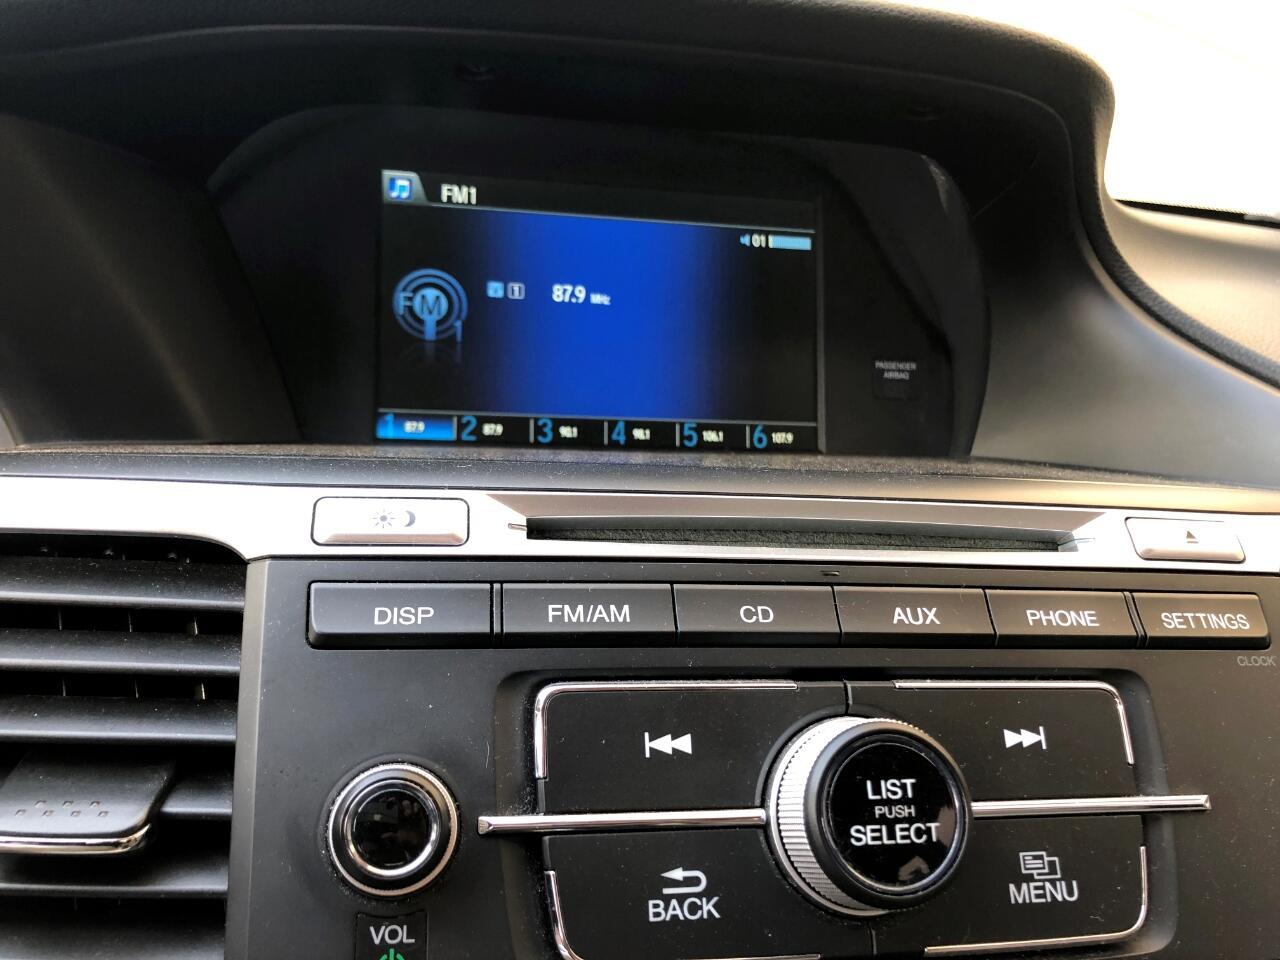 2013 Honda Accord Sdn 4dr I4 CVT LX